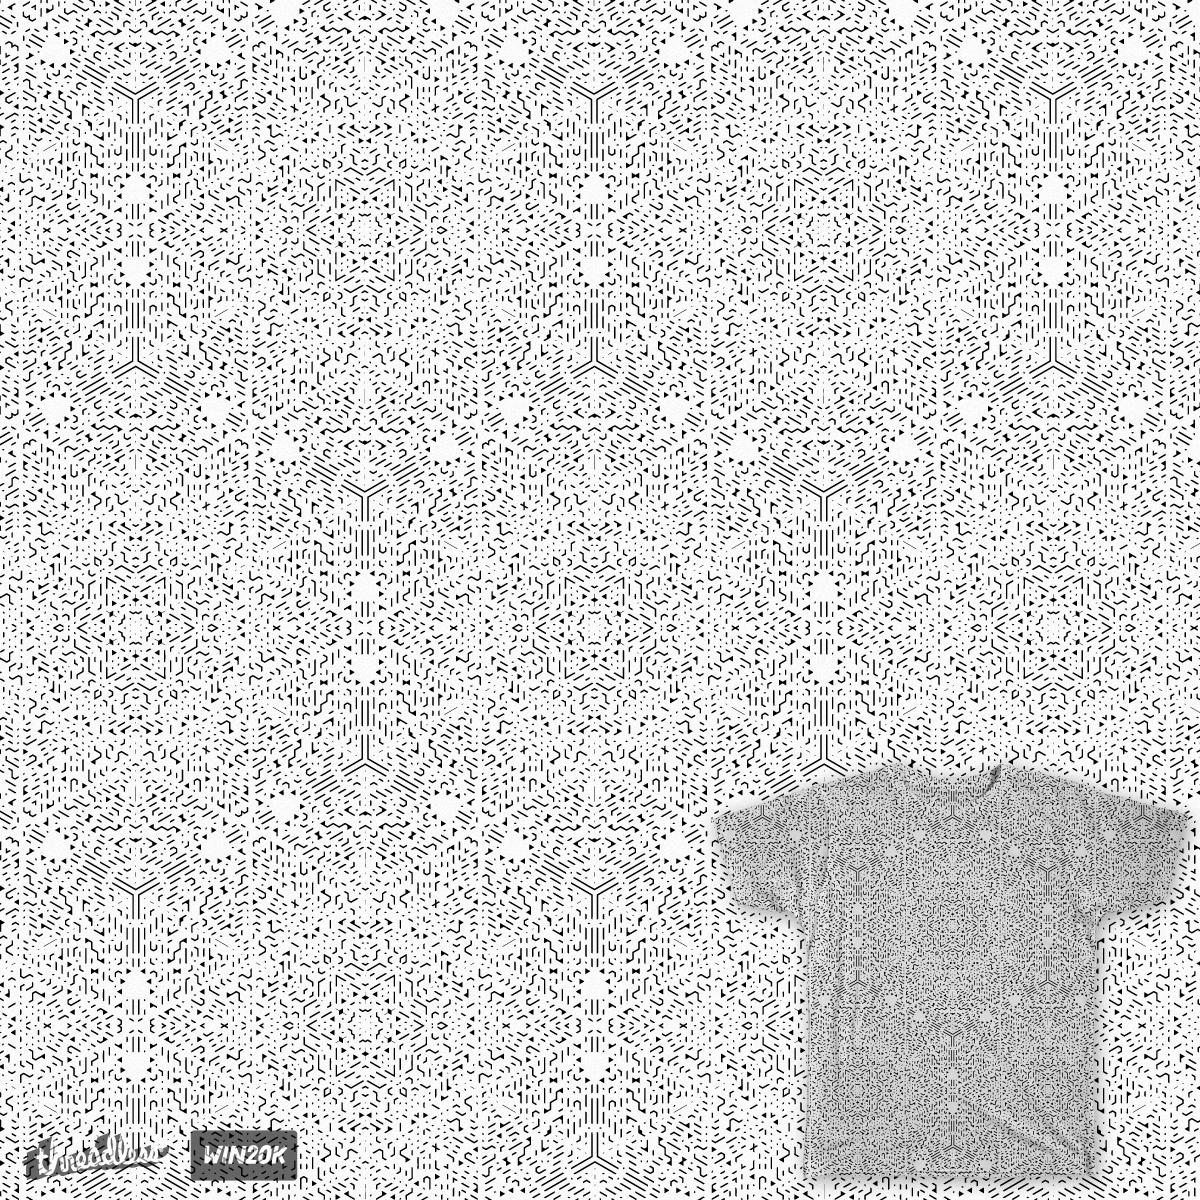 Maze by Solano on Threadless